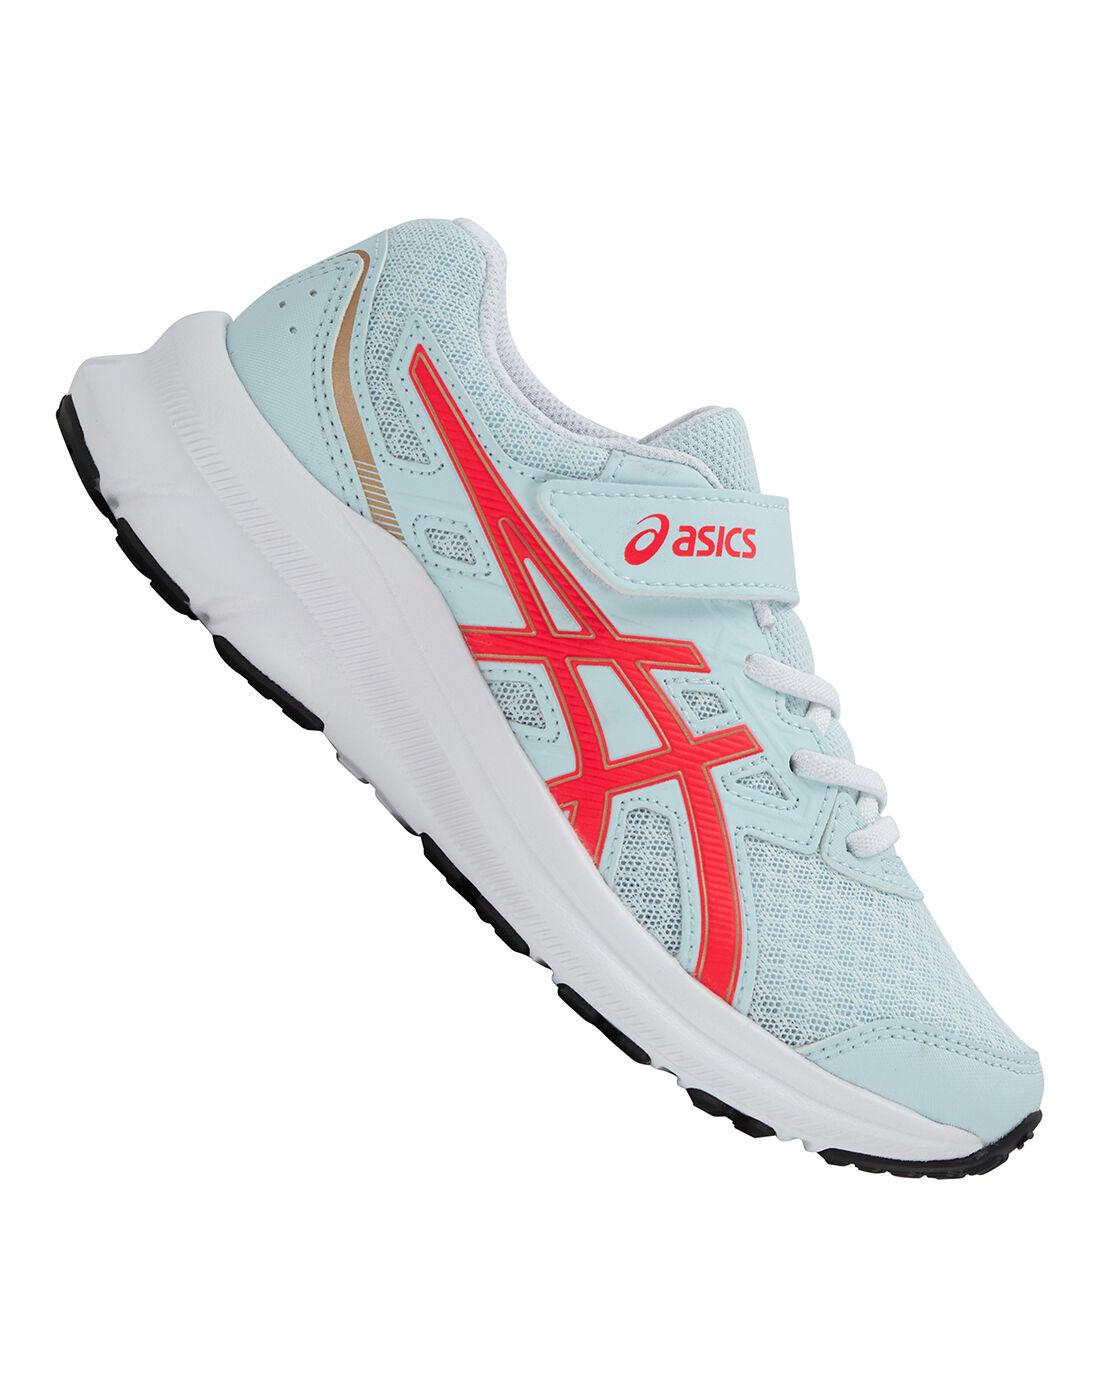 Asics adidas canal walk contact details today | Younger Girls Jolt 3